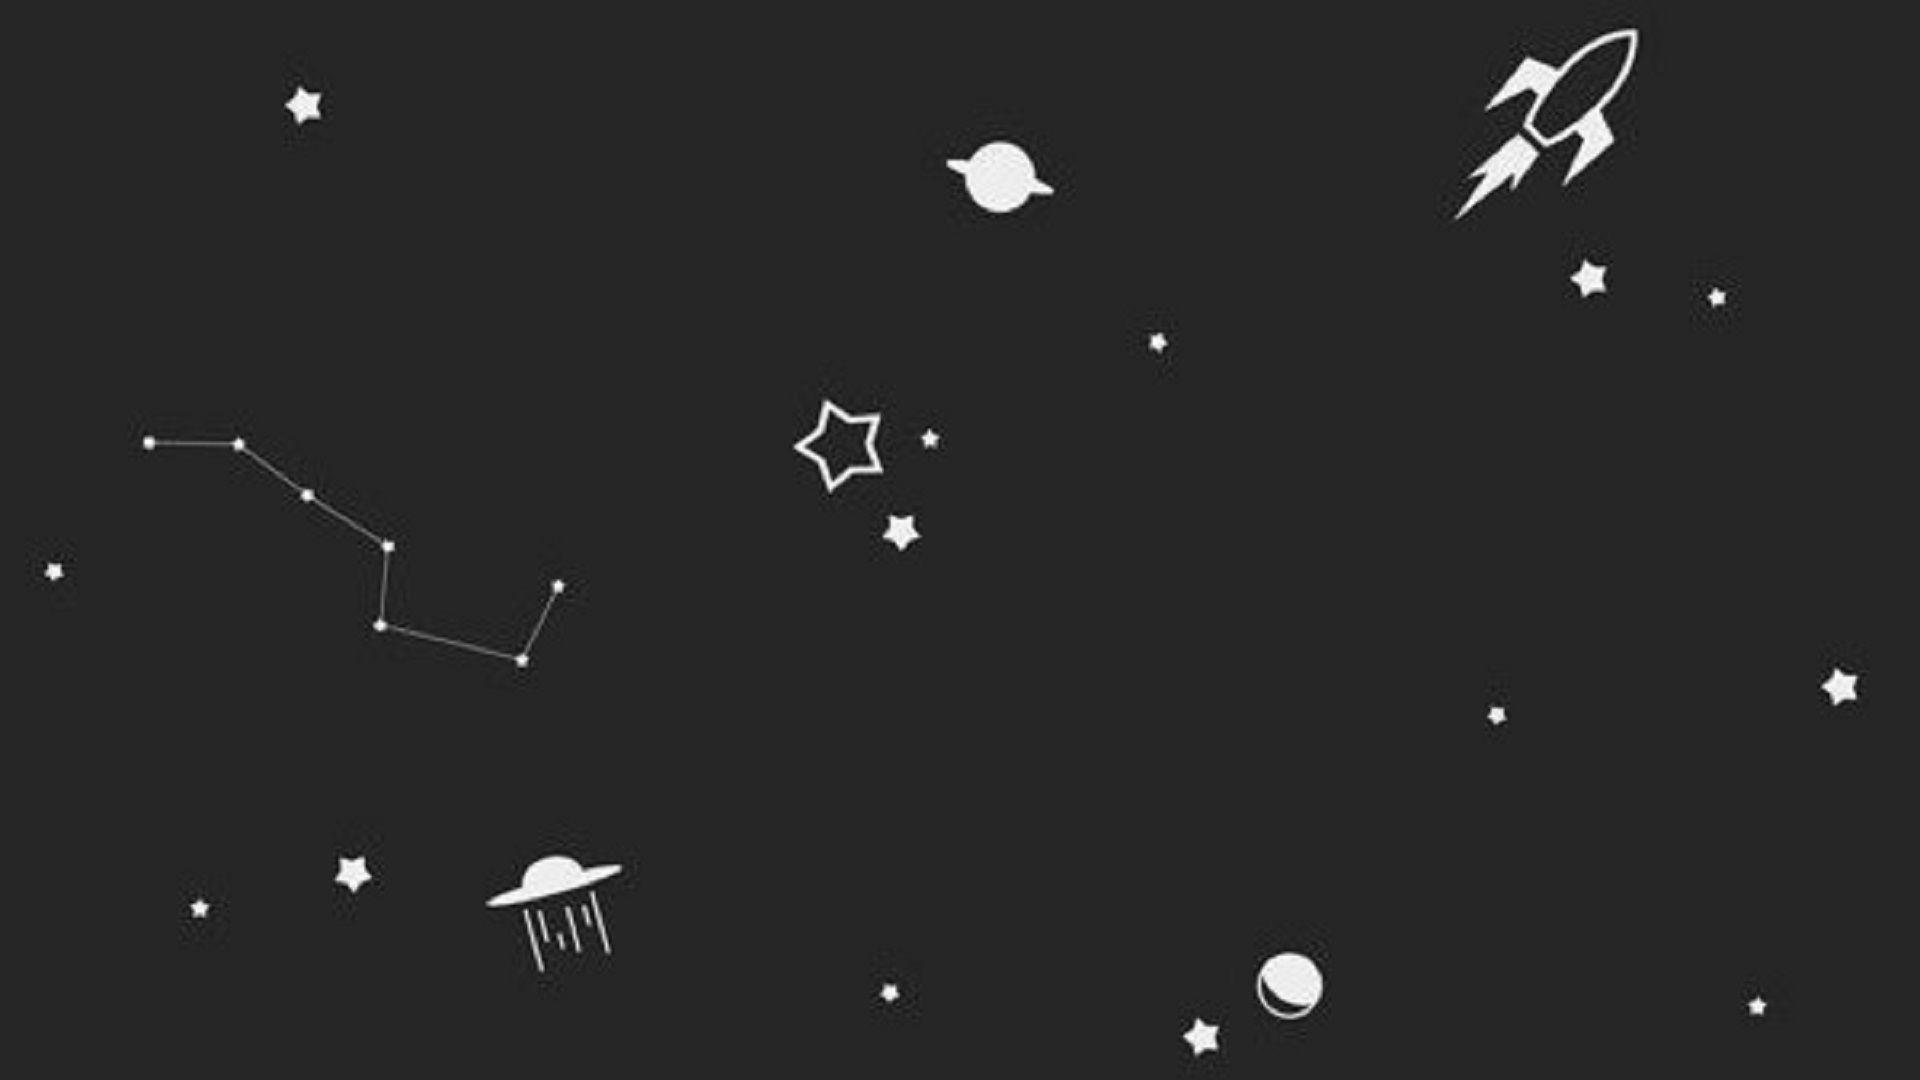 Black Aesthetic Desktop Wallpaper Posted By Ethan Walker